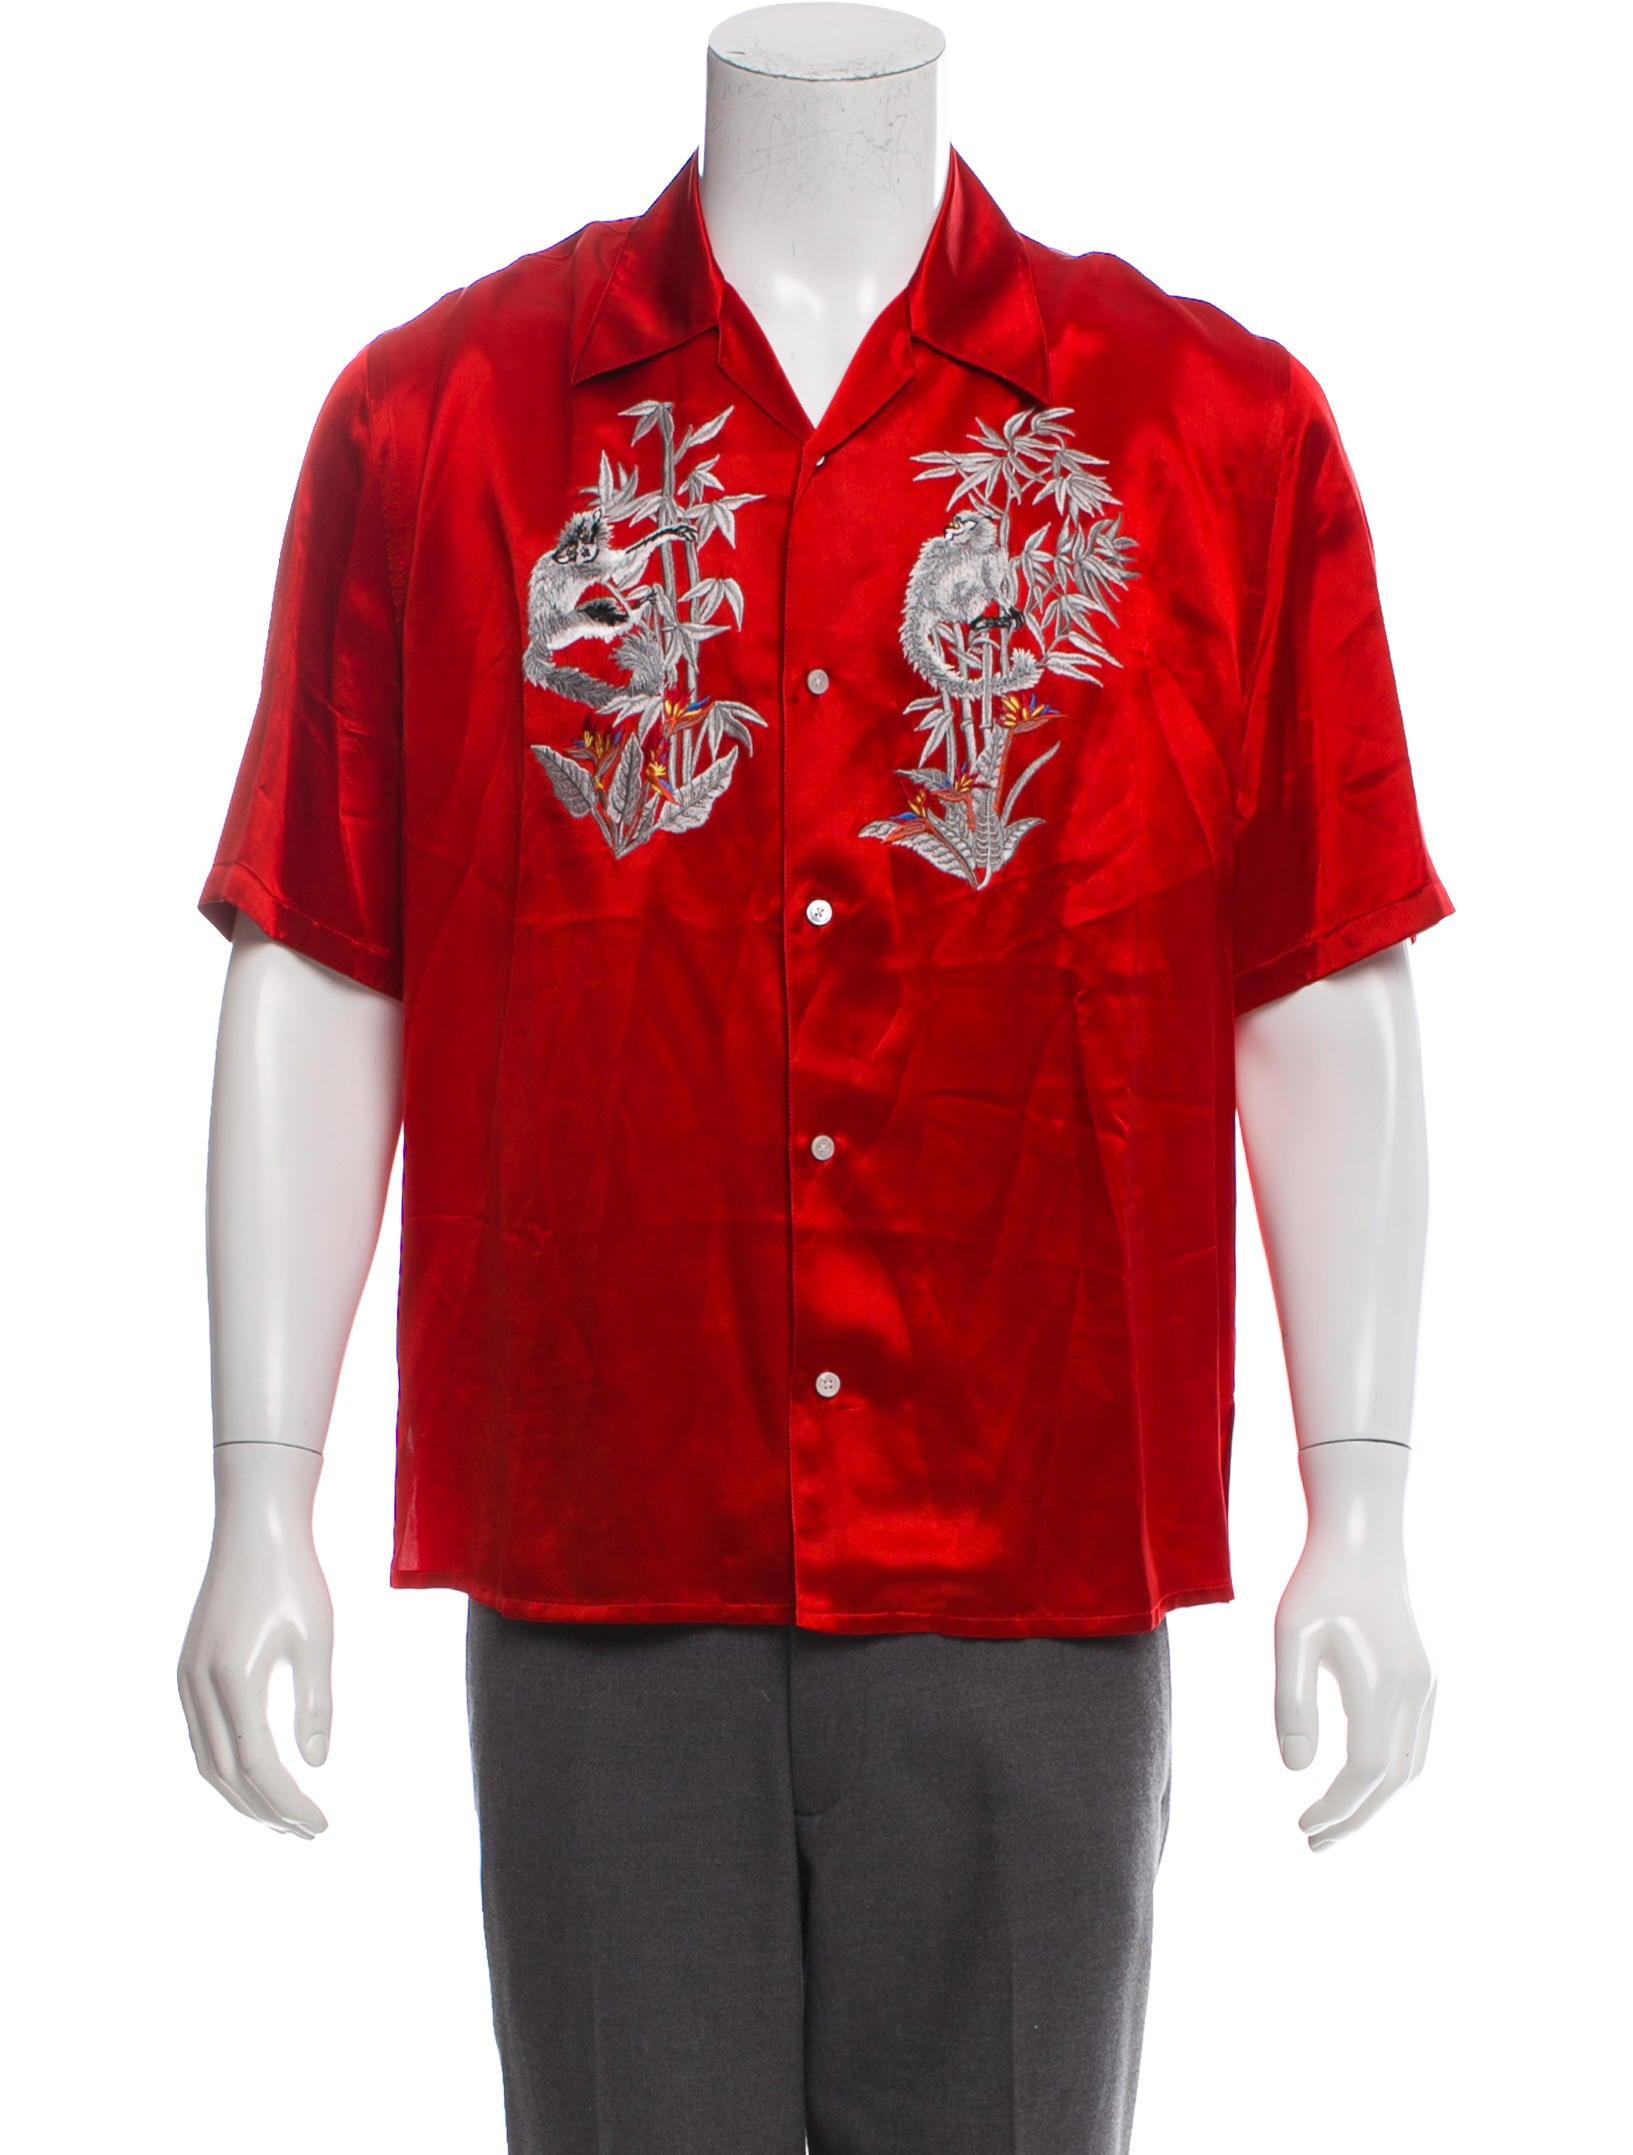 2ba6acfa0afb Louis Vuitton Embroidered Satin Shirt - Clothing - LOU200377